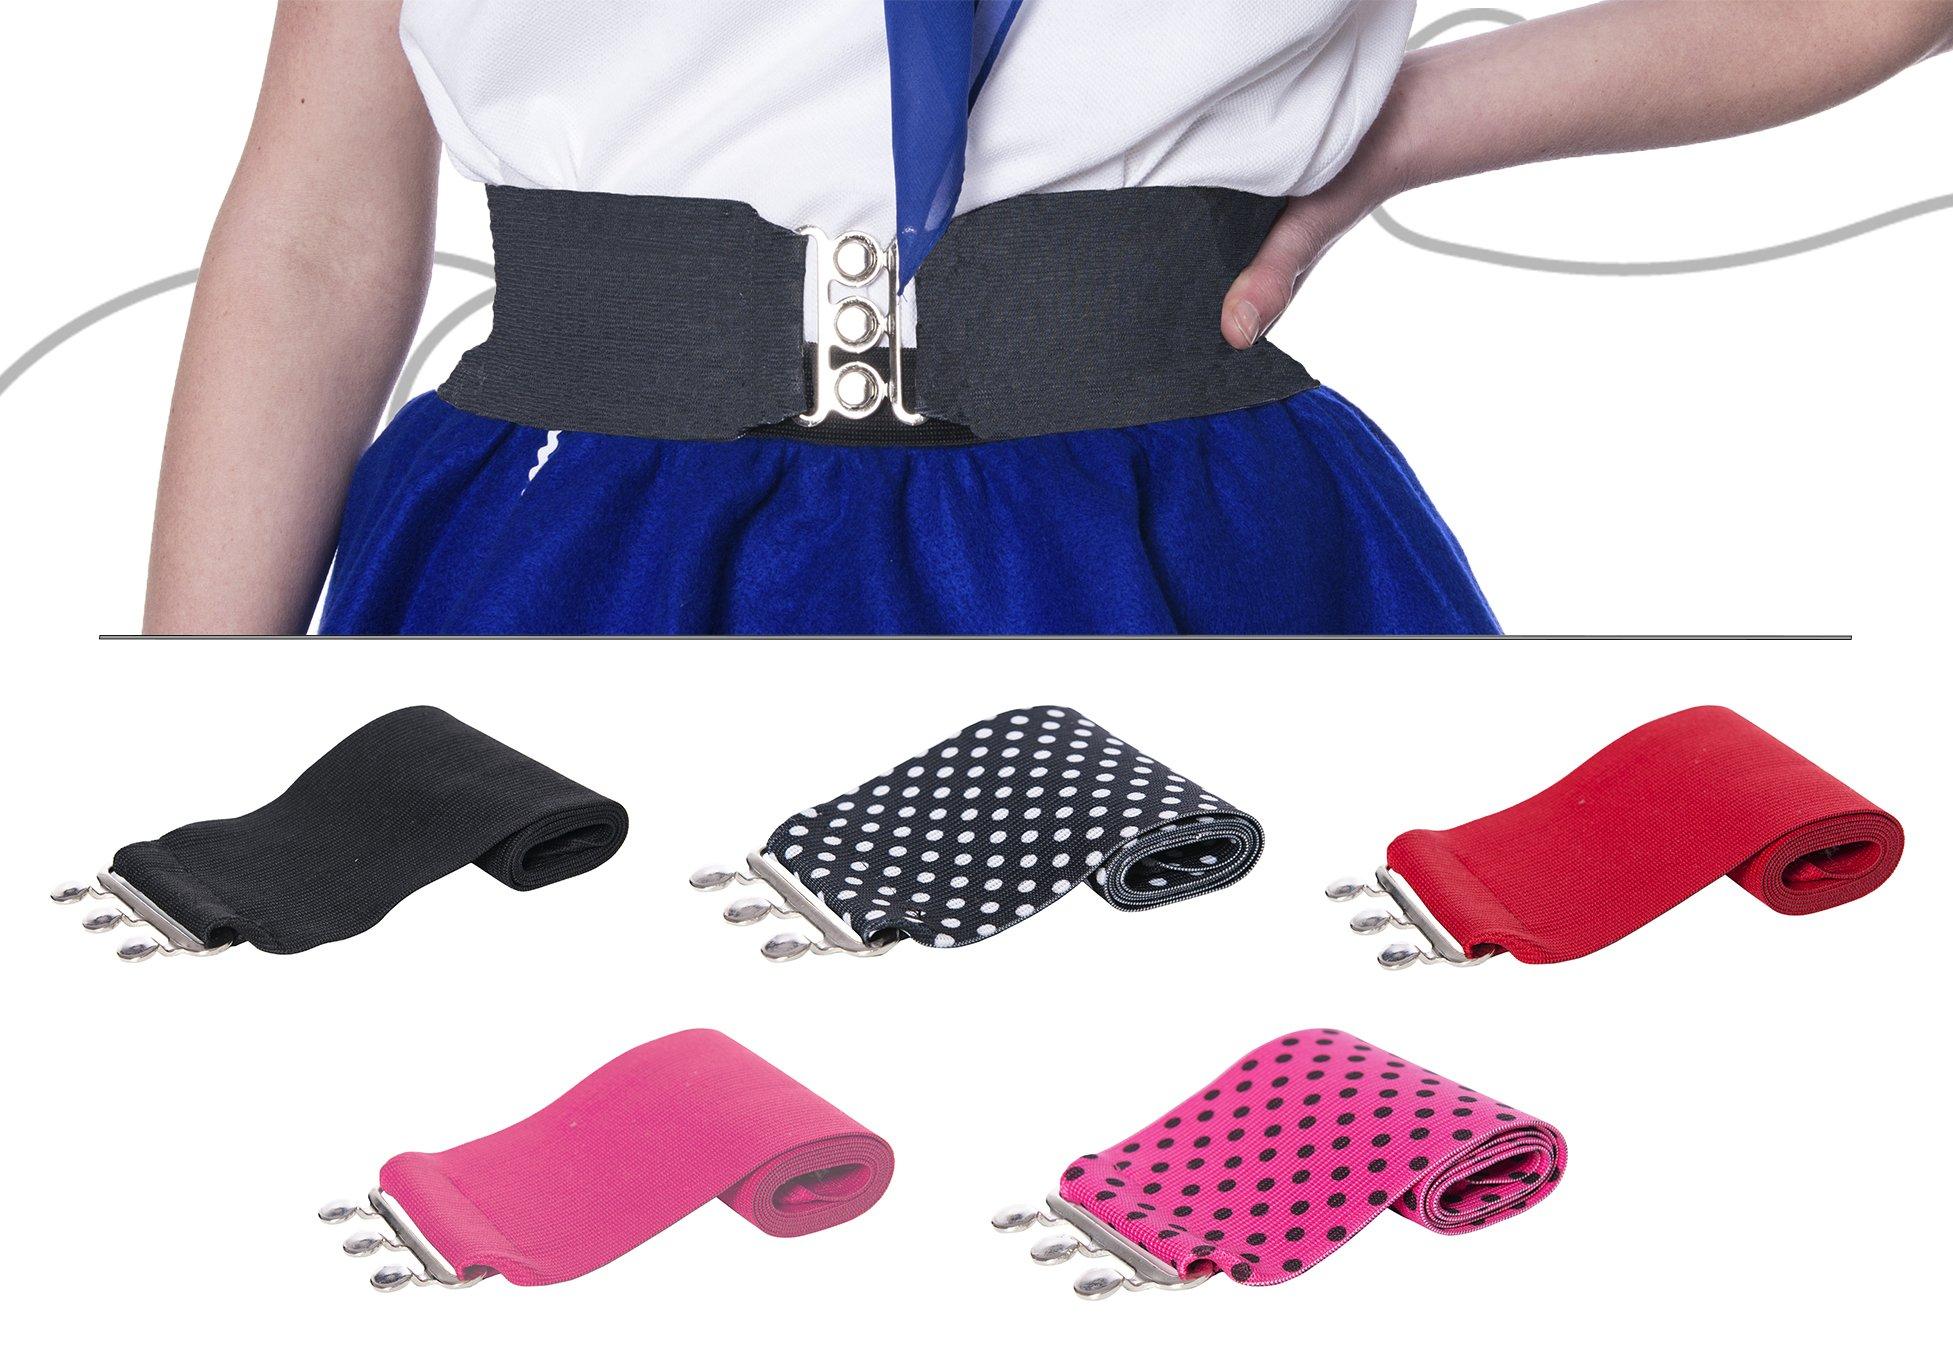 "Silver Clasp 50s Style Cinch 3"" Wide Elastic Belt for Women Junior and Plus Sizes Black M/L by Hip Hop 50s Shop (Image #6)"